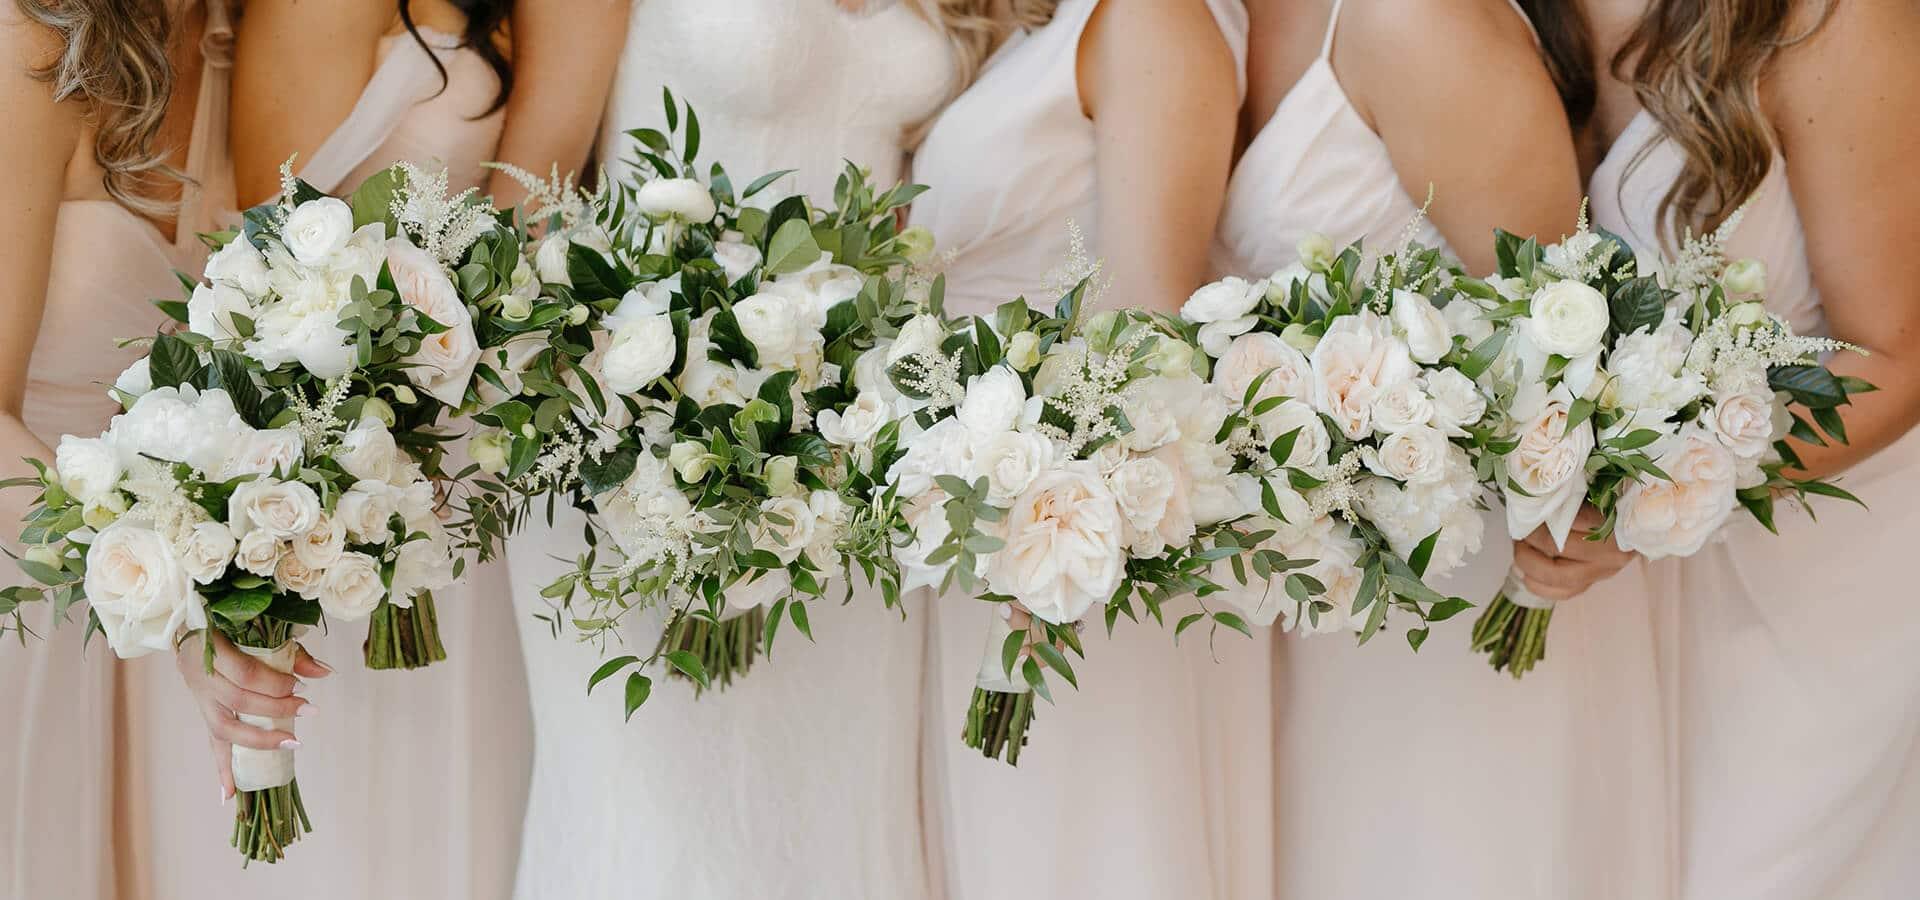 Hero image for Erica and Michael's Modern-yet-Elegant Wedding at The Arlington Estate